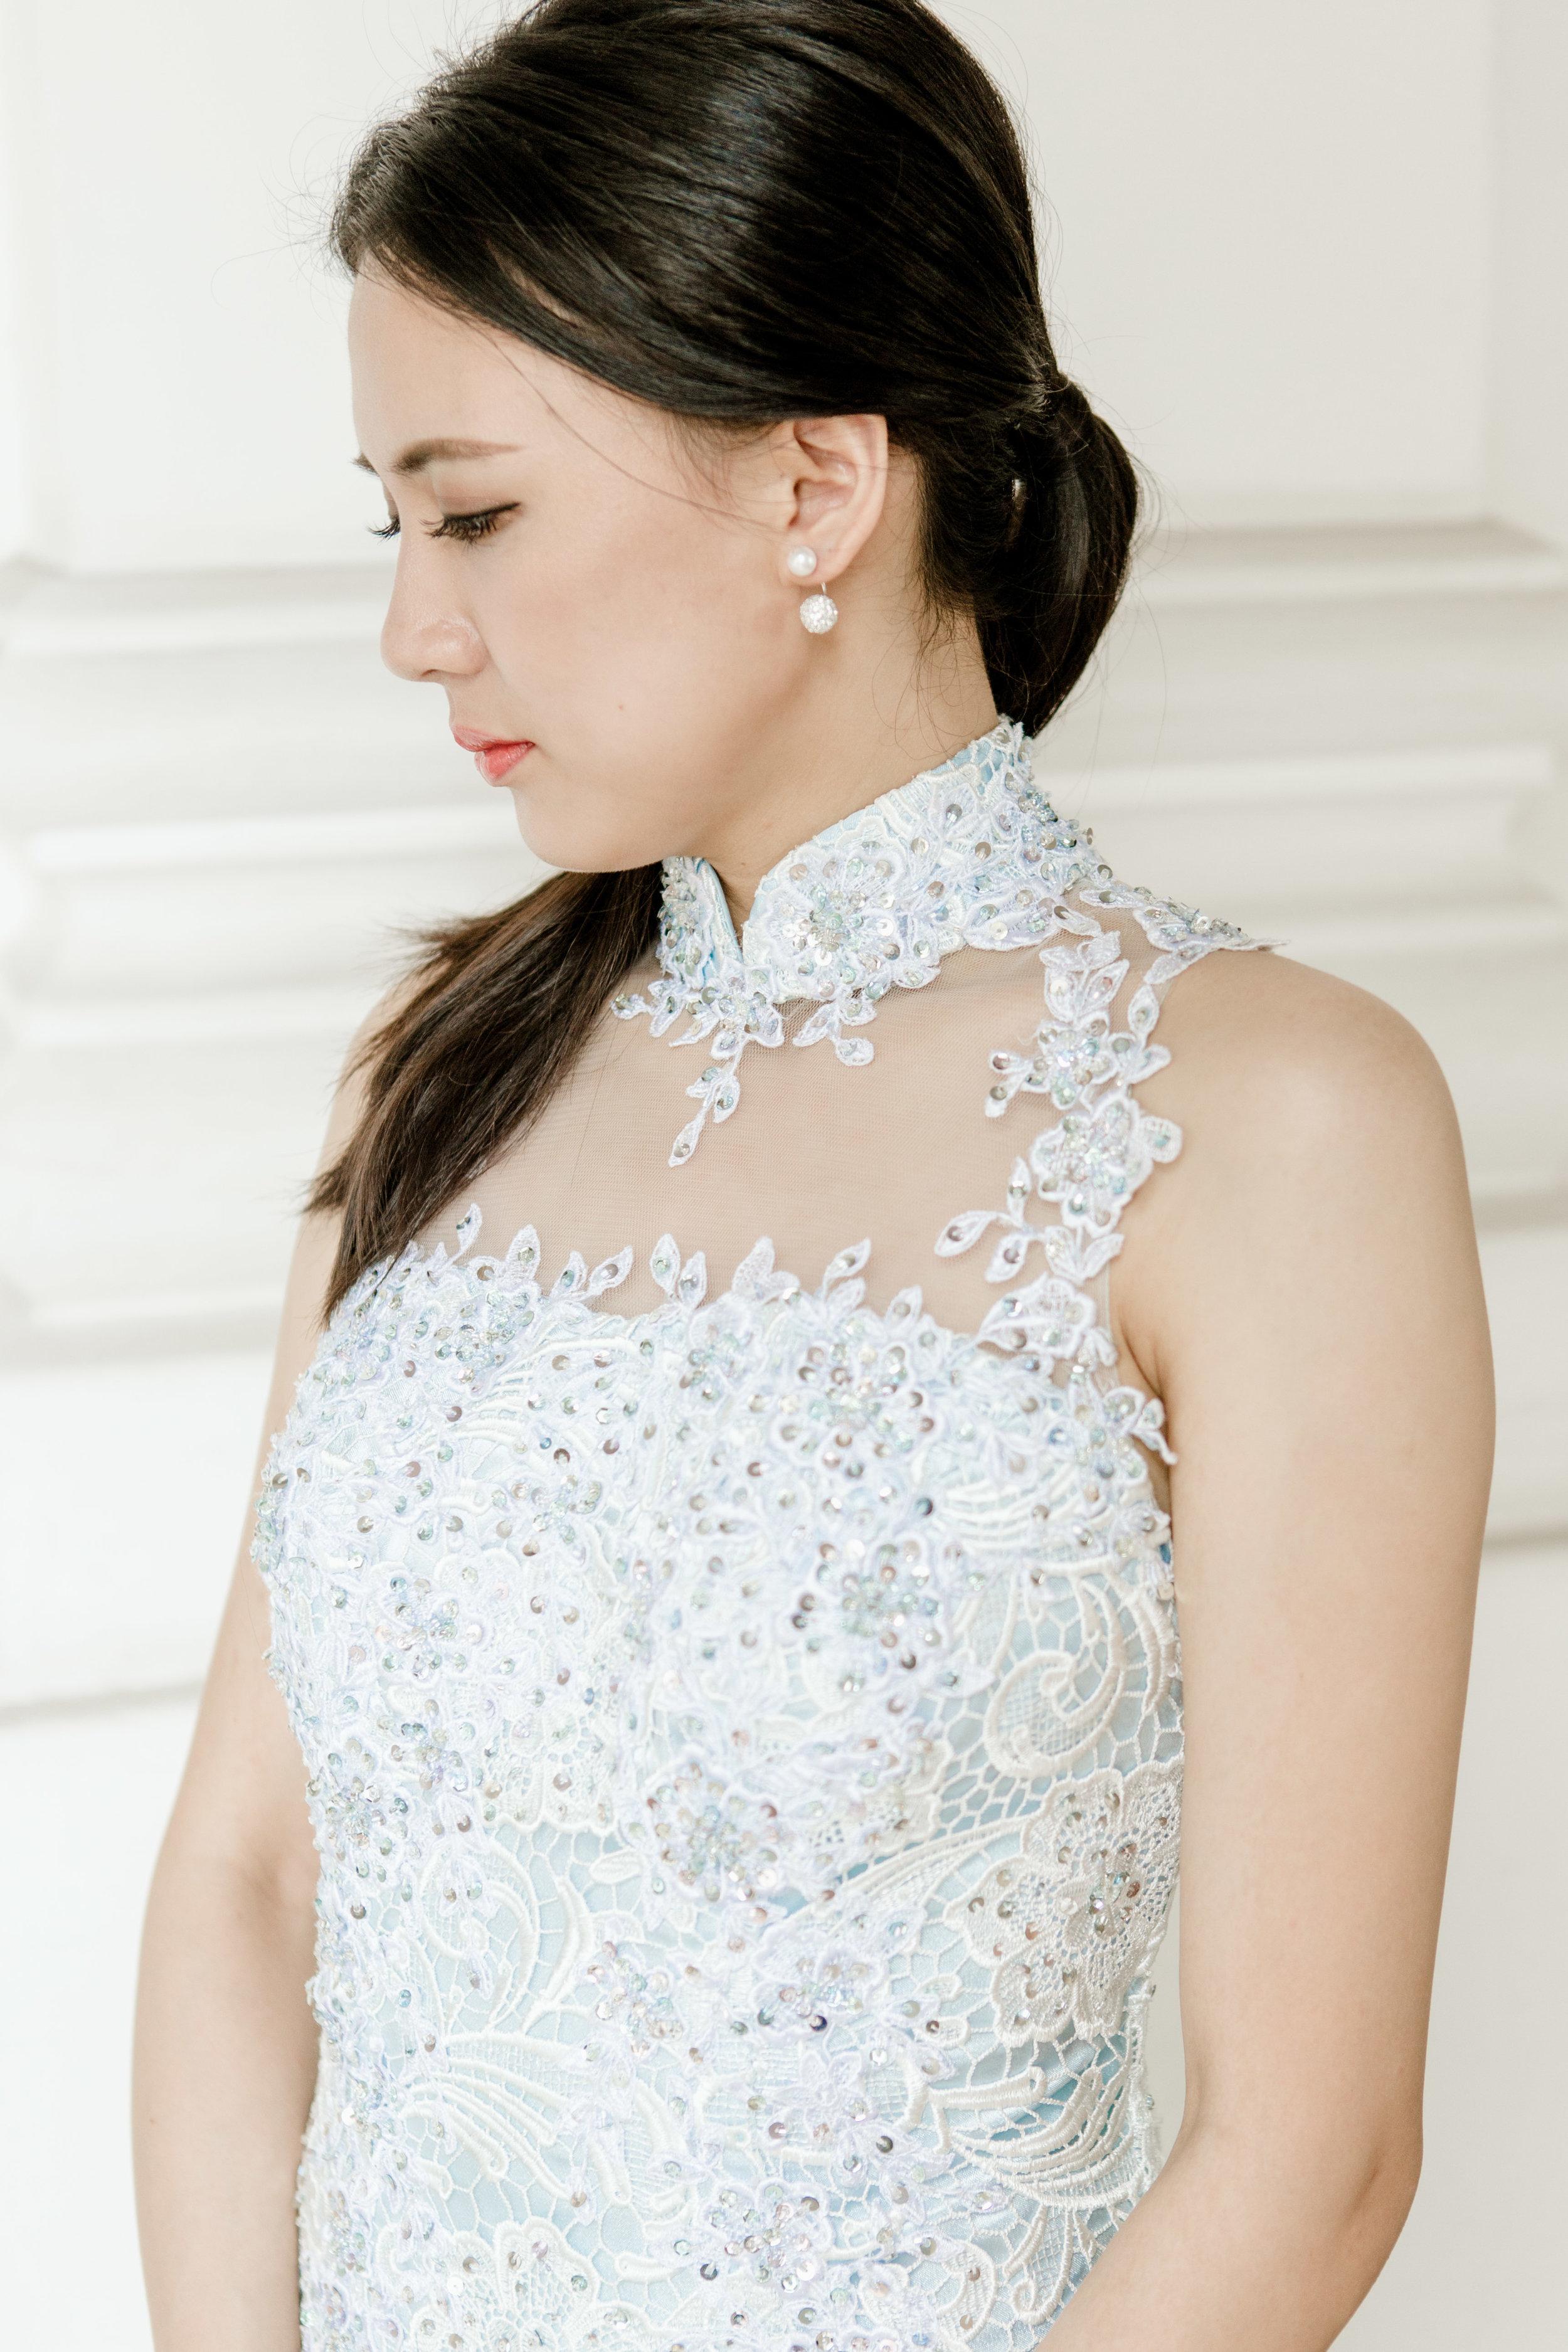 ccm wedding mandarin collar